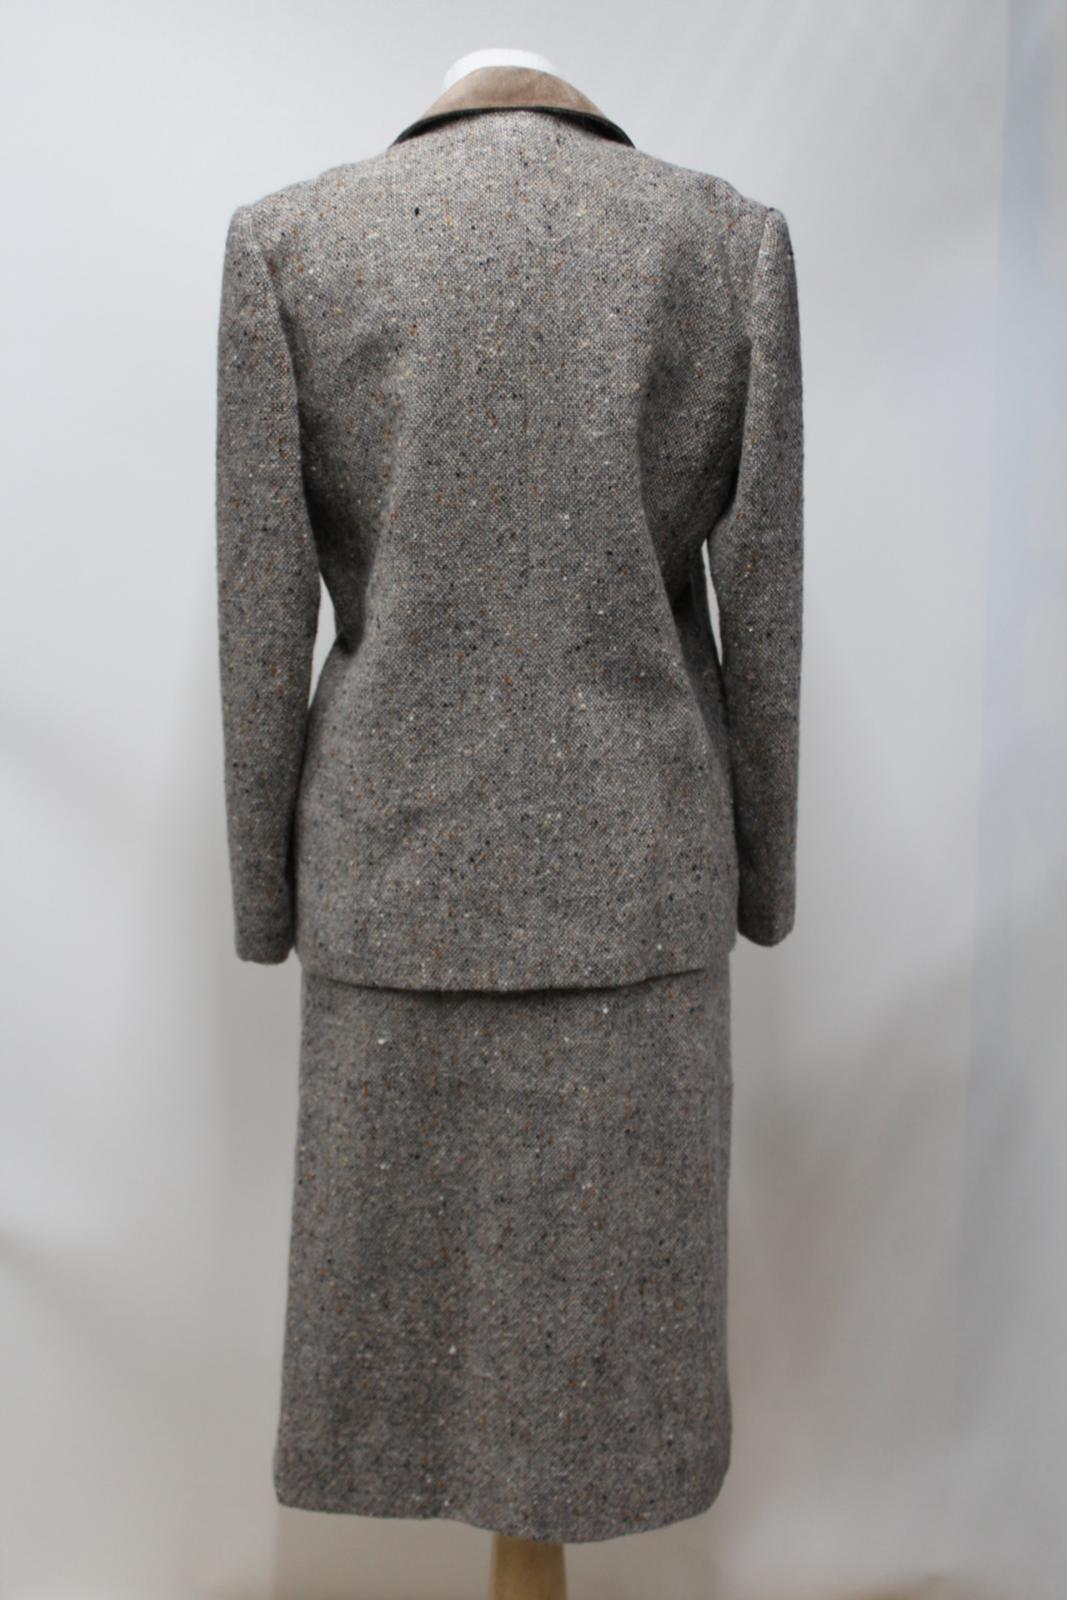 Gold Skirt Suit Jacket Tweed Eu40 With Brown Fernande Trim Size Desgranges Uk12 1n0OxA